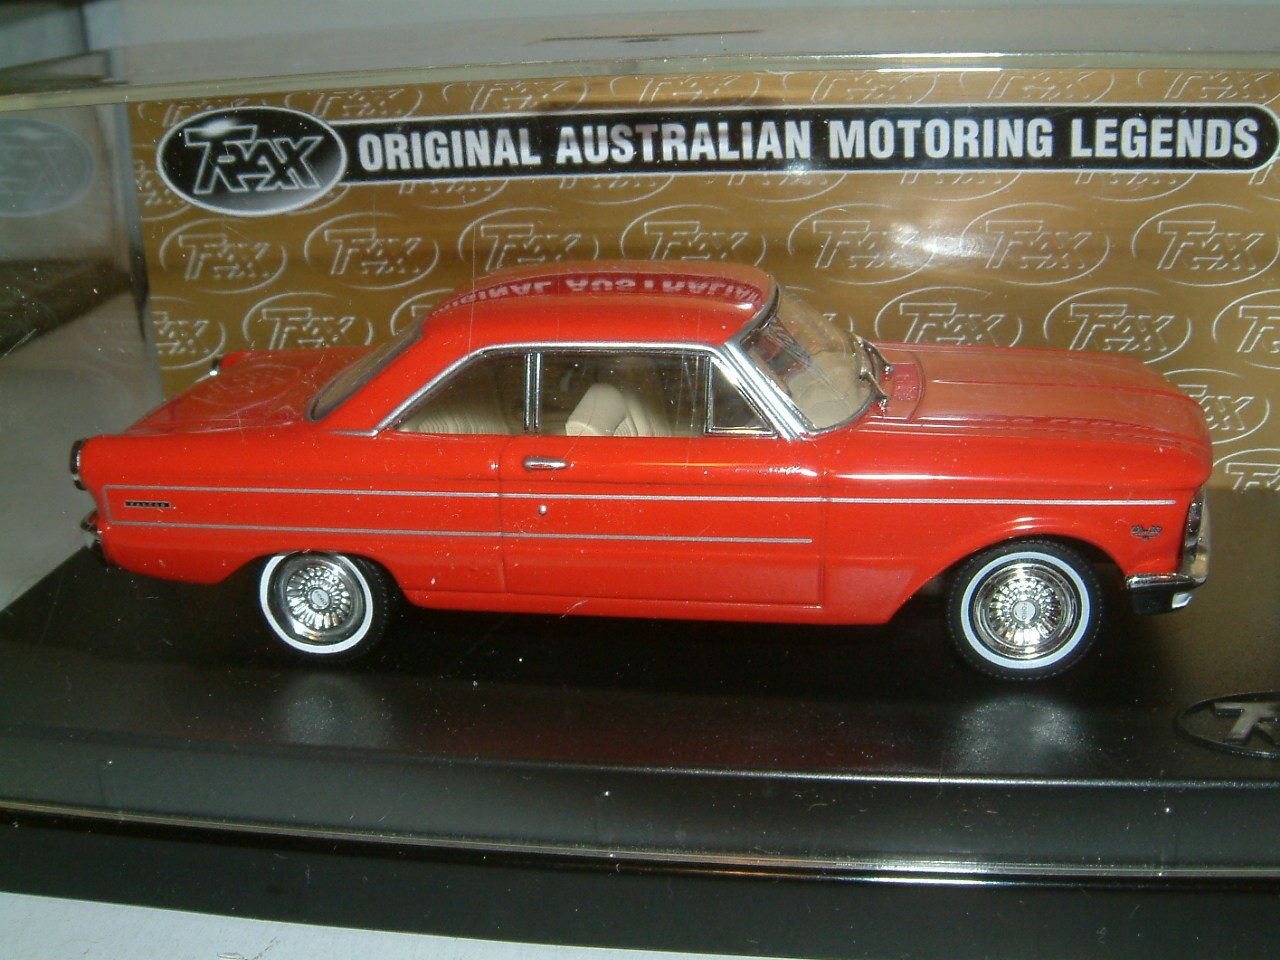 1 43 TRAX 1965 FORD XP FALCON FUTURA HARDTOP IN rot . AUSTRALIA TG